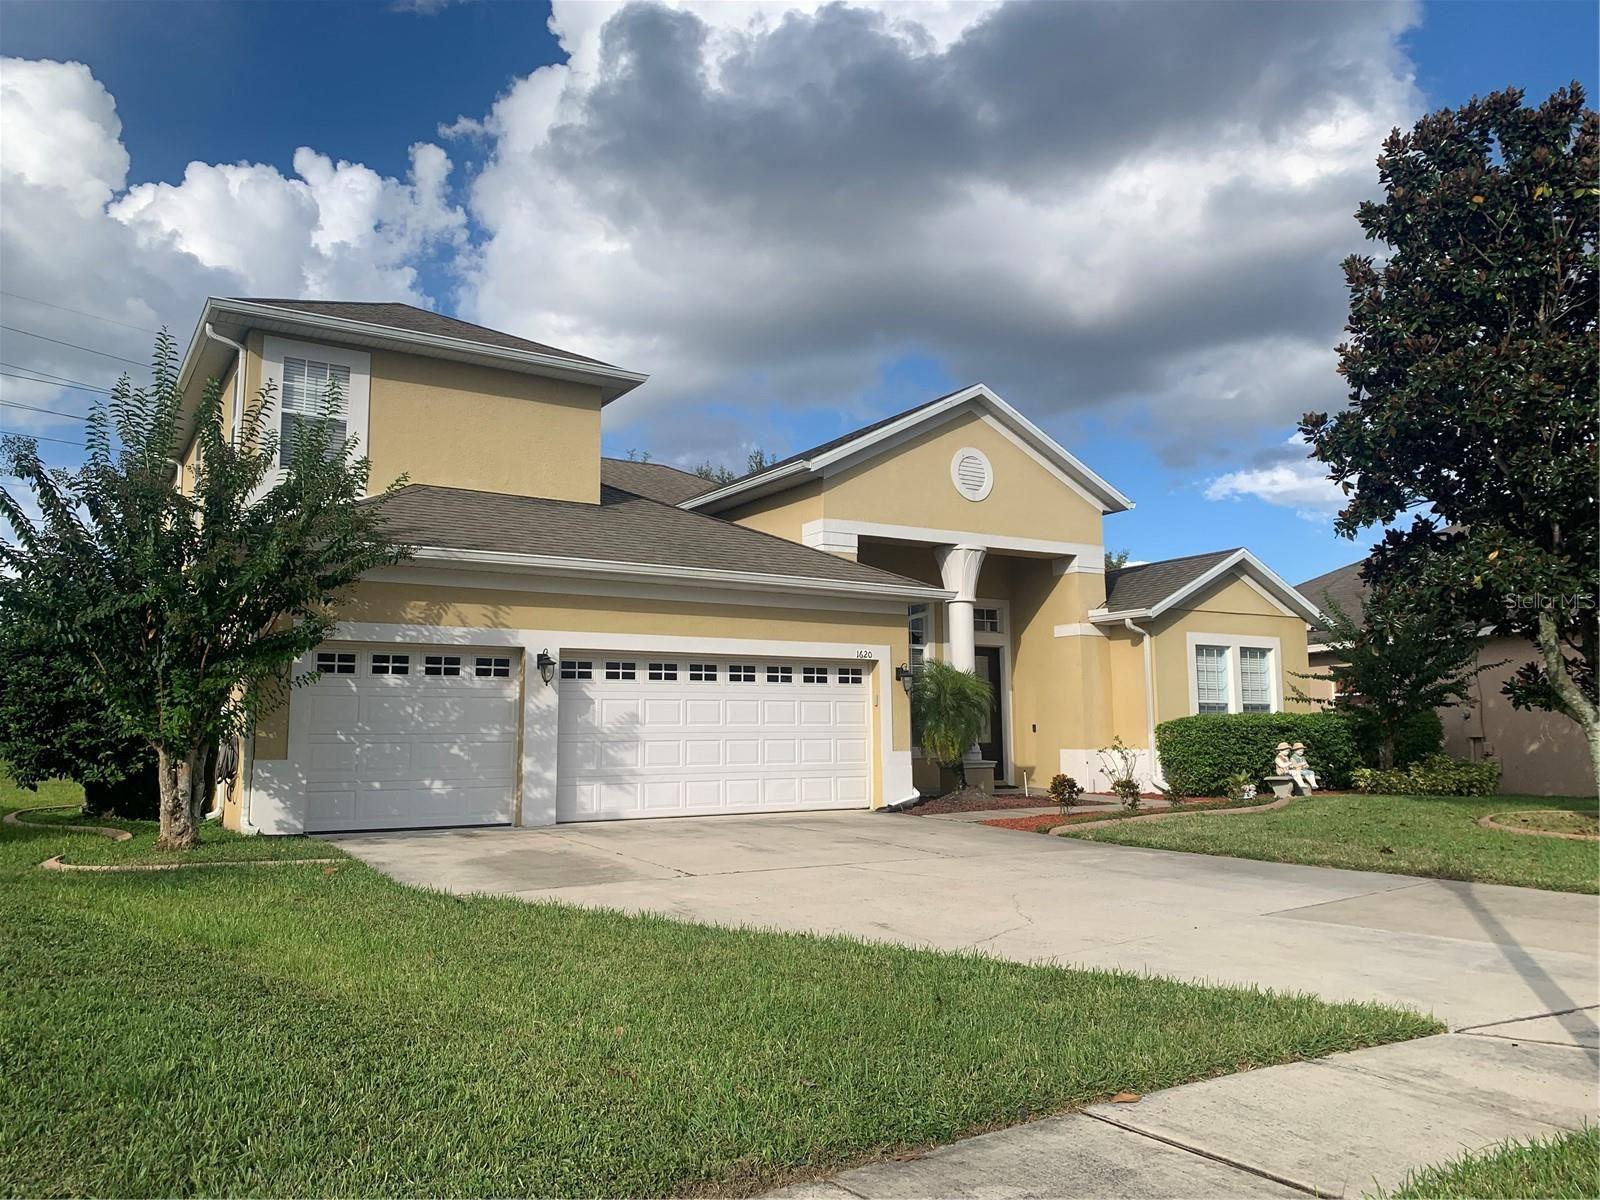 1620 WHITEFRIAR DRIVE, Ocoee, FL 34761 - #: O5978037